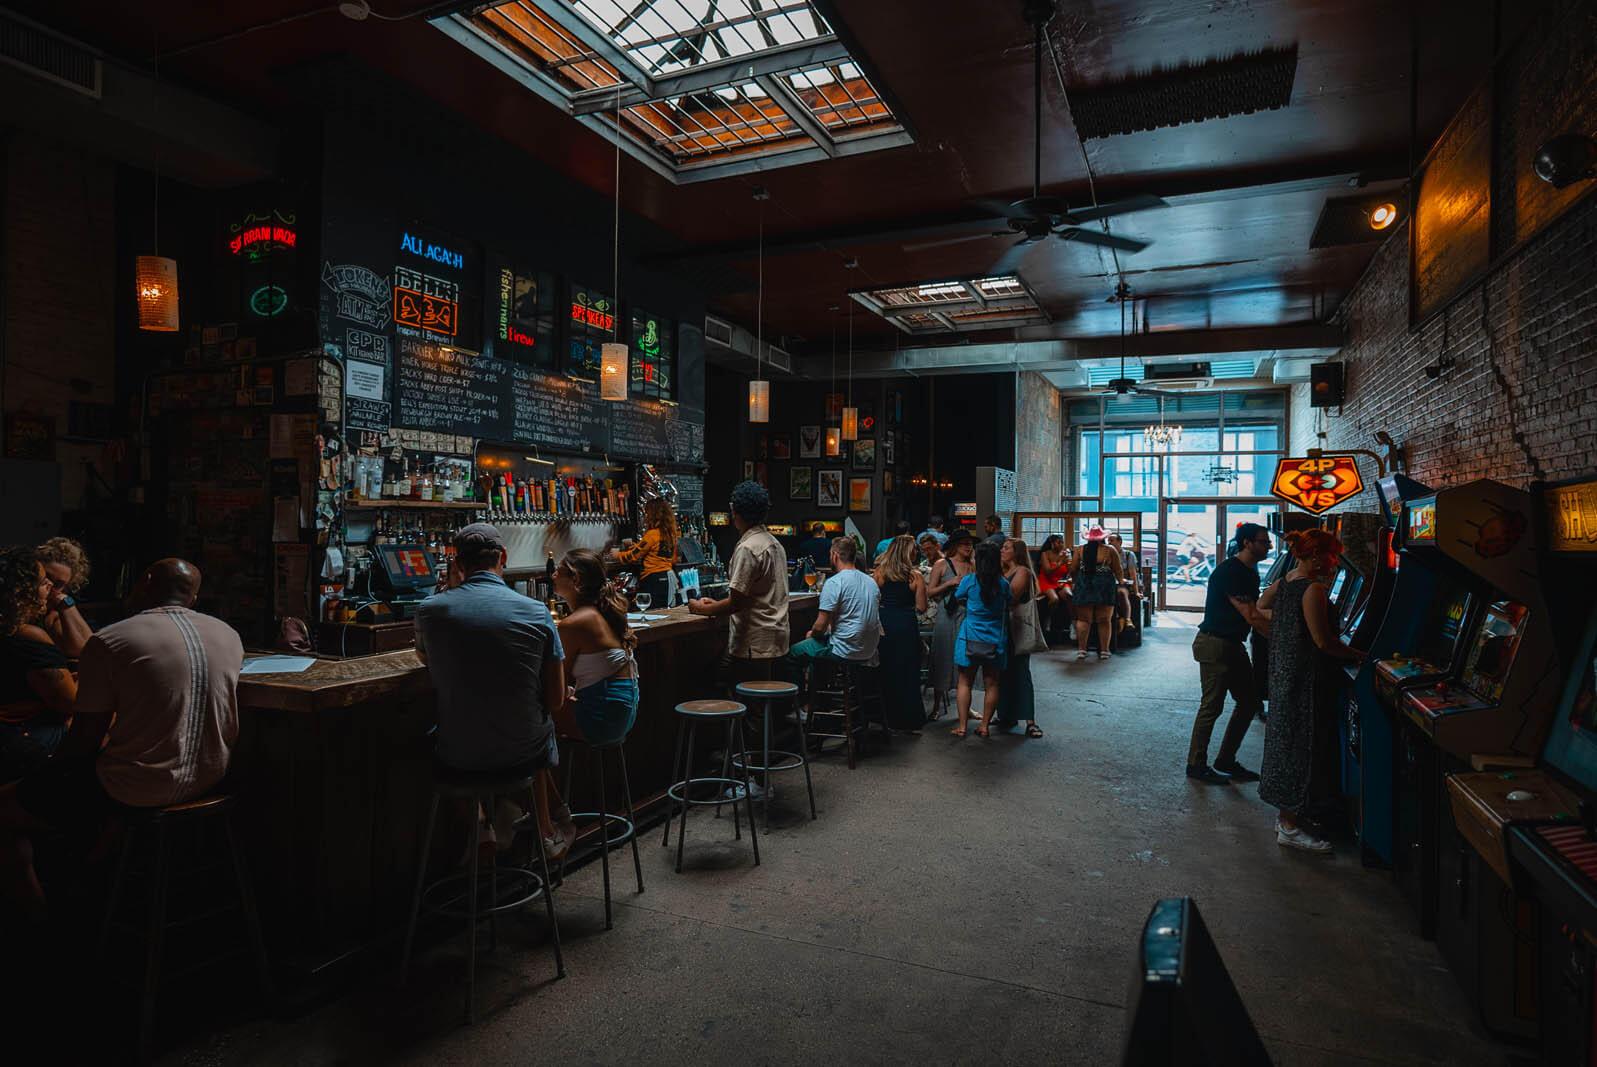 Barcade bar and arcade in Williamsburg Brooklyn